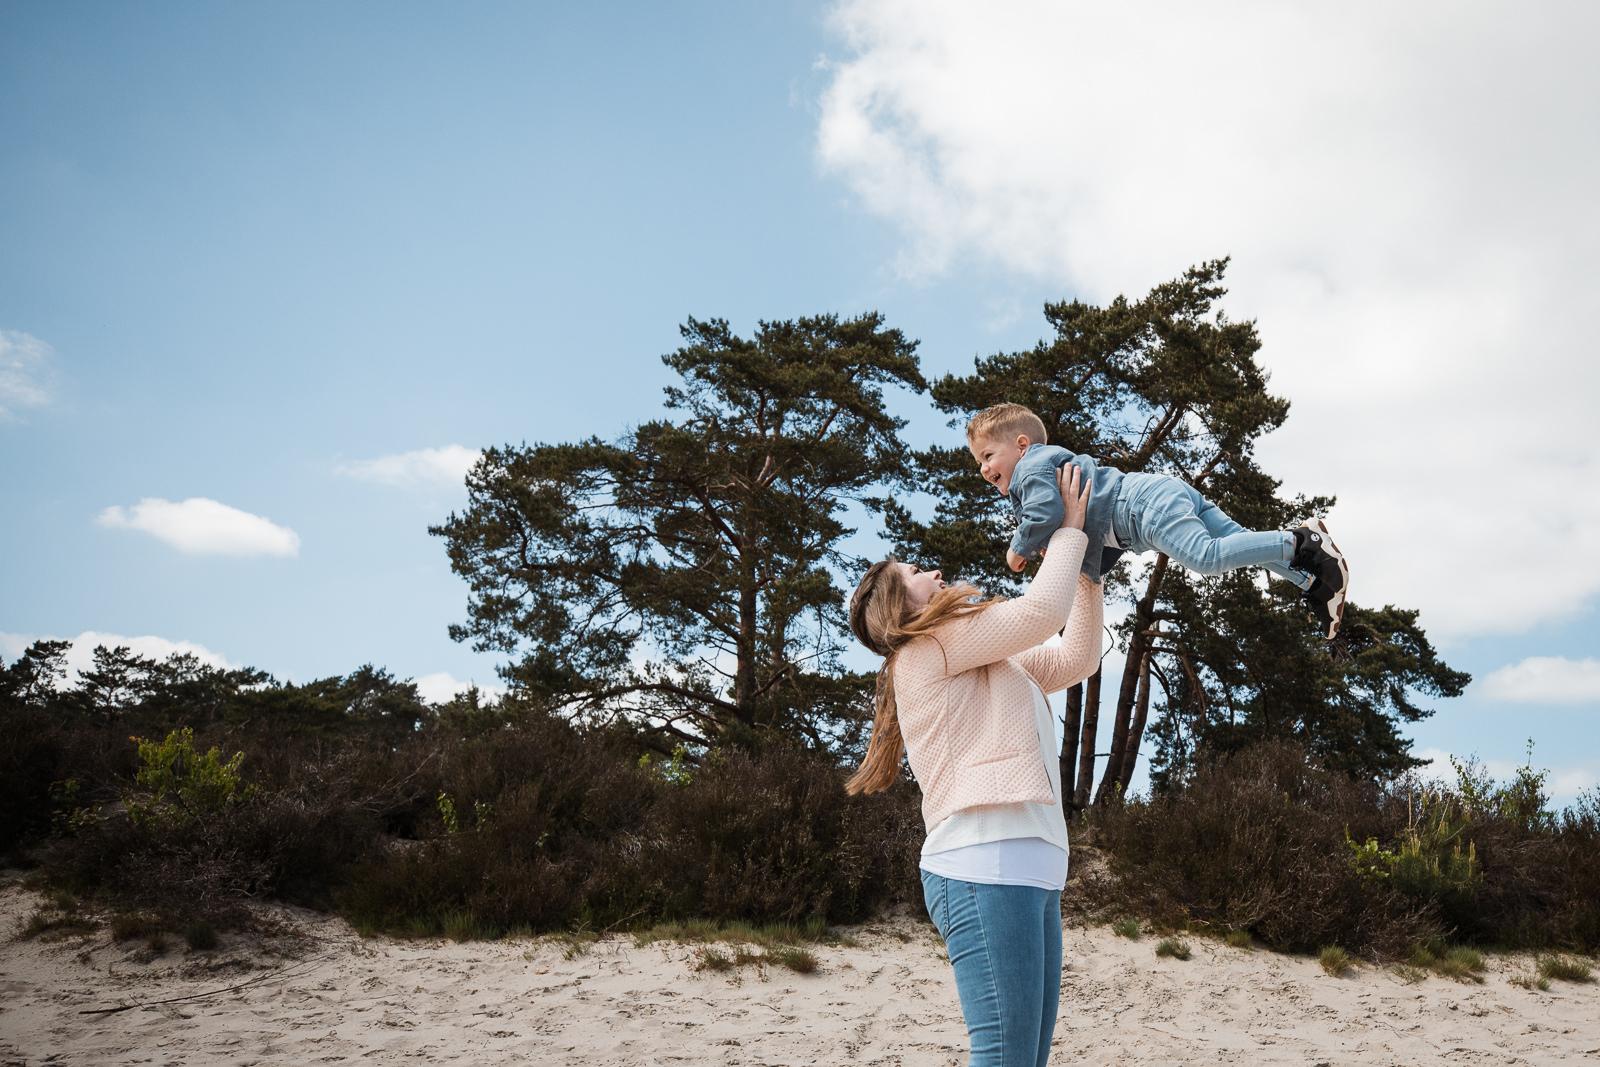 Portretfotograaf Soesterduinen